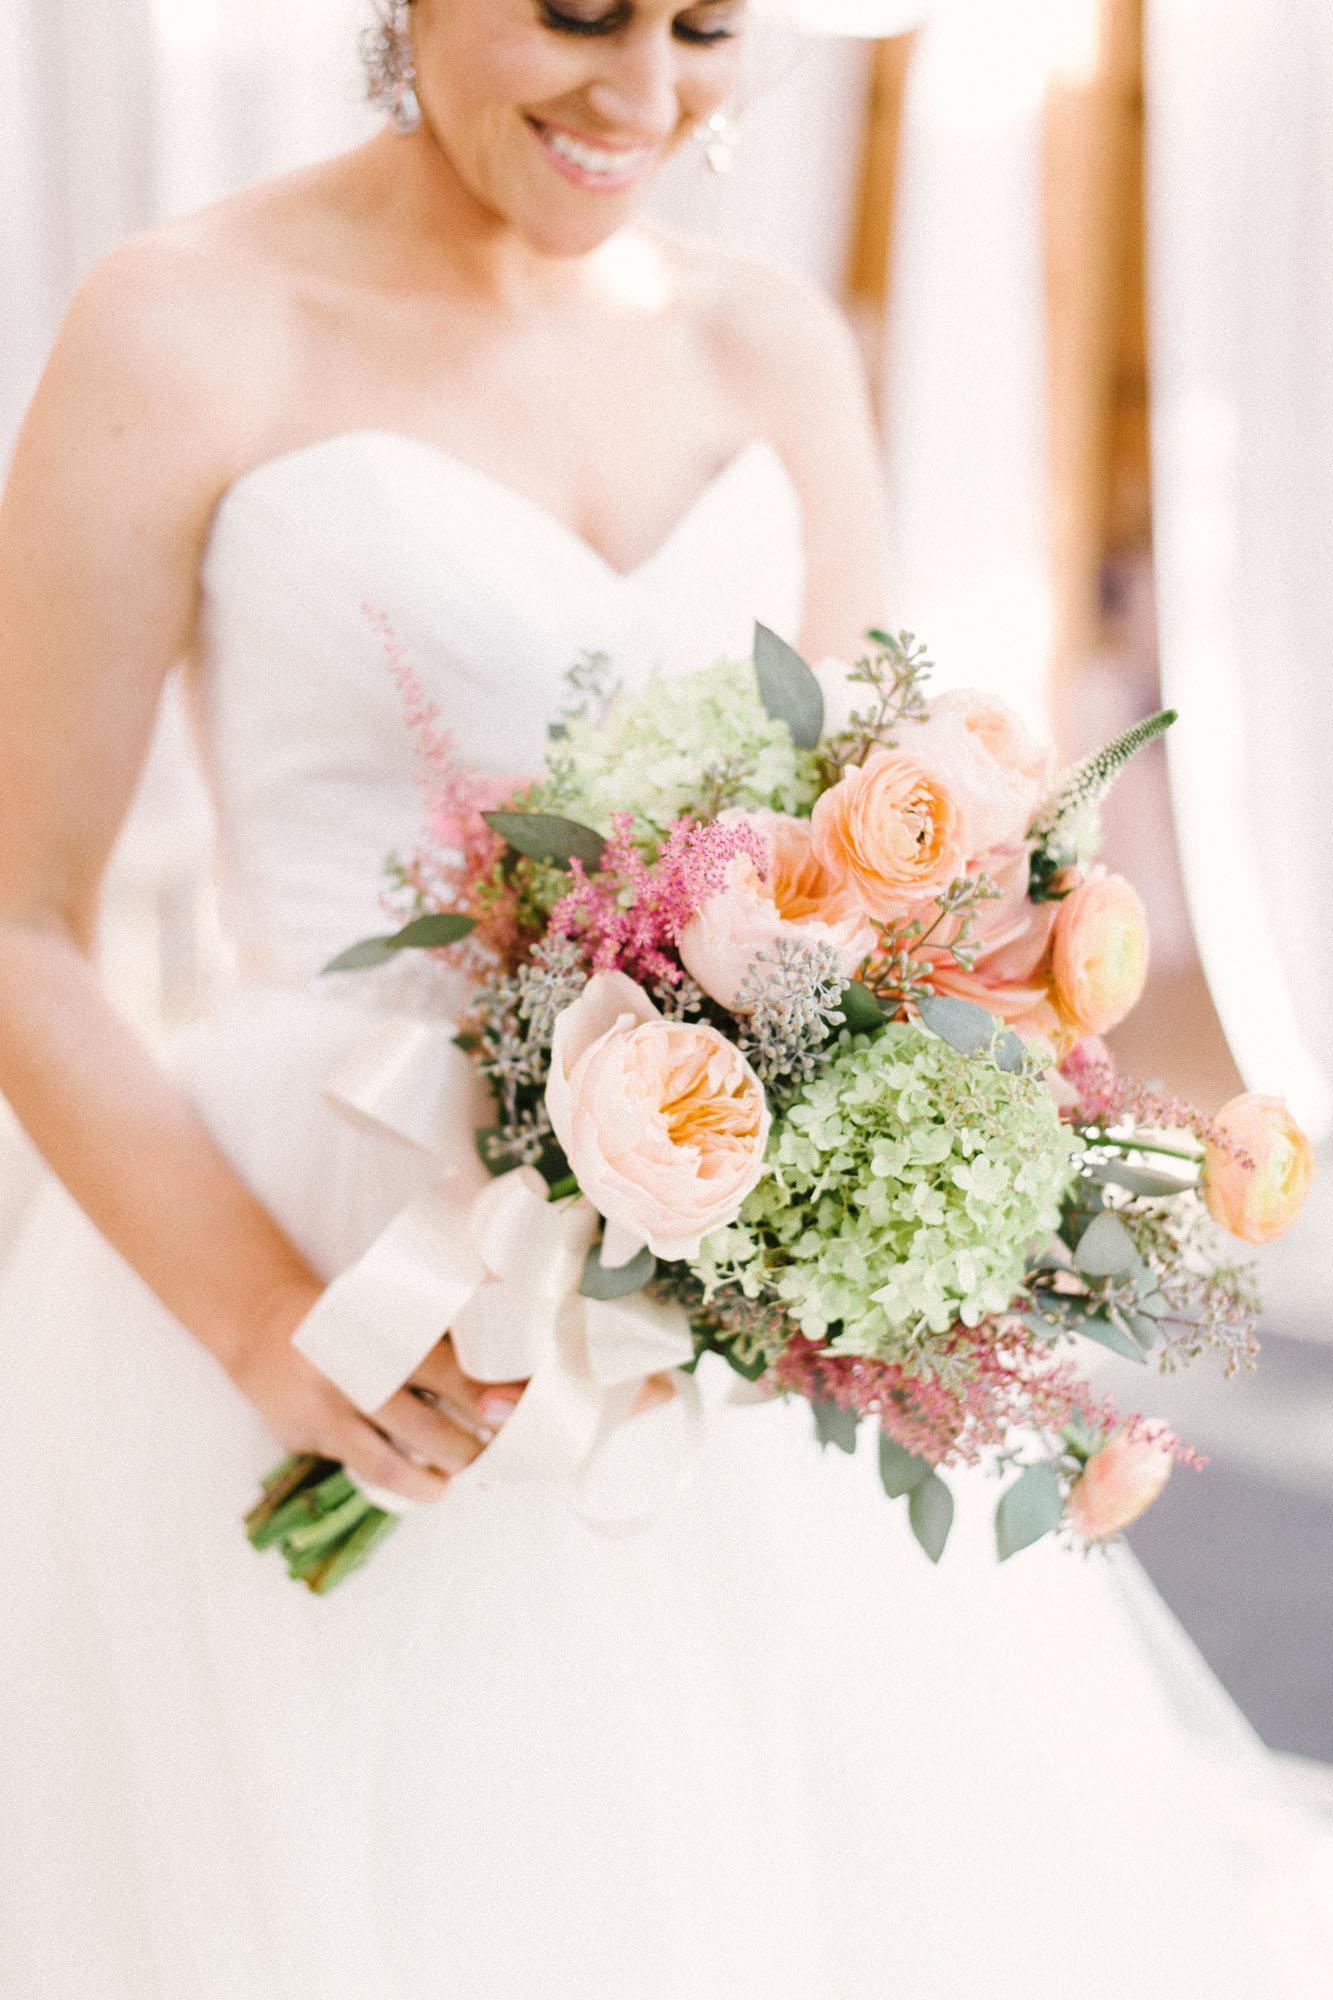 SM anna smith photography wedding photographer venue wedding planner-384.jpg